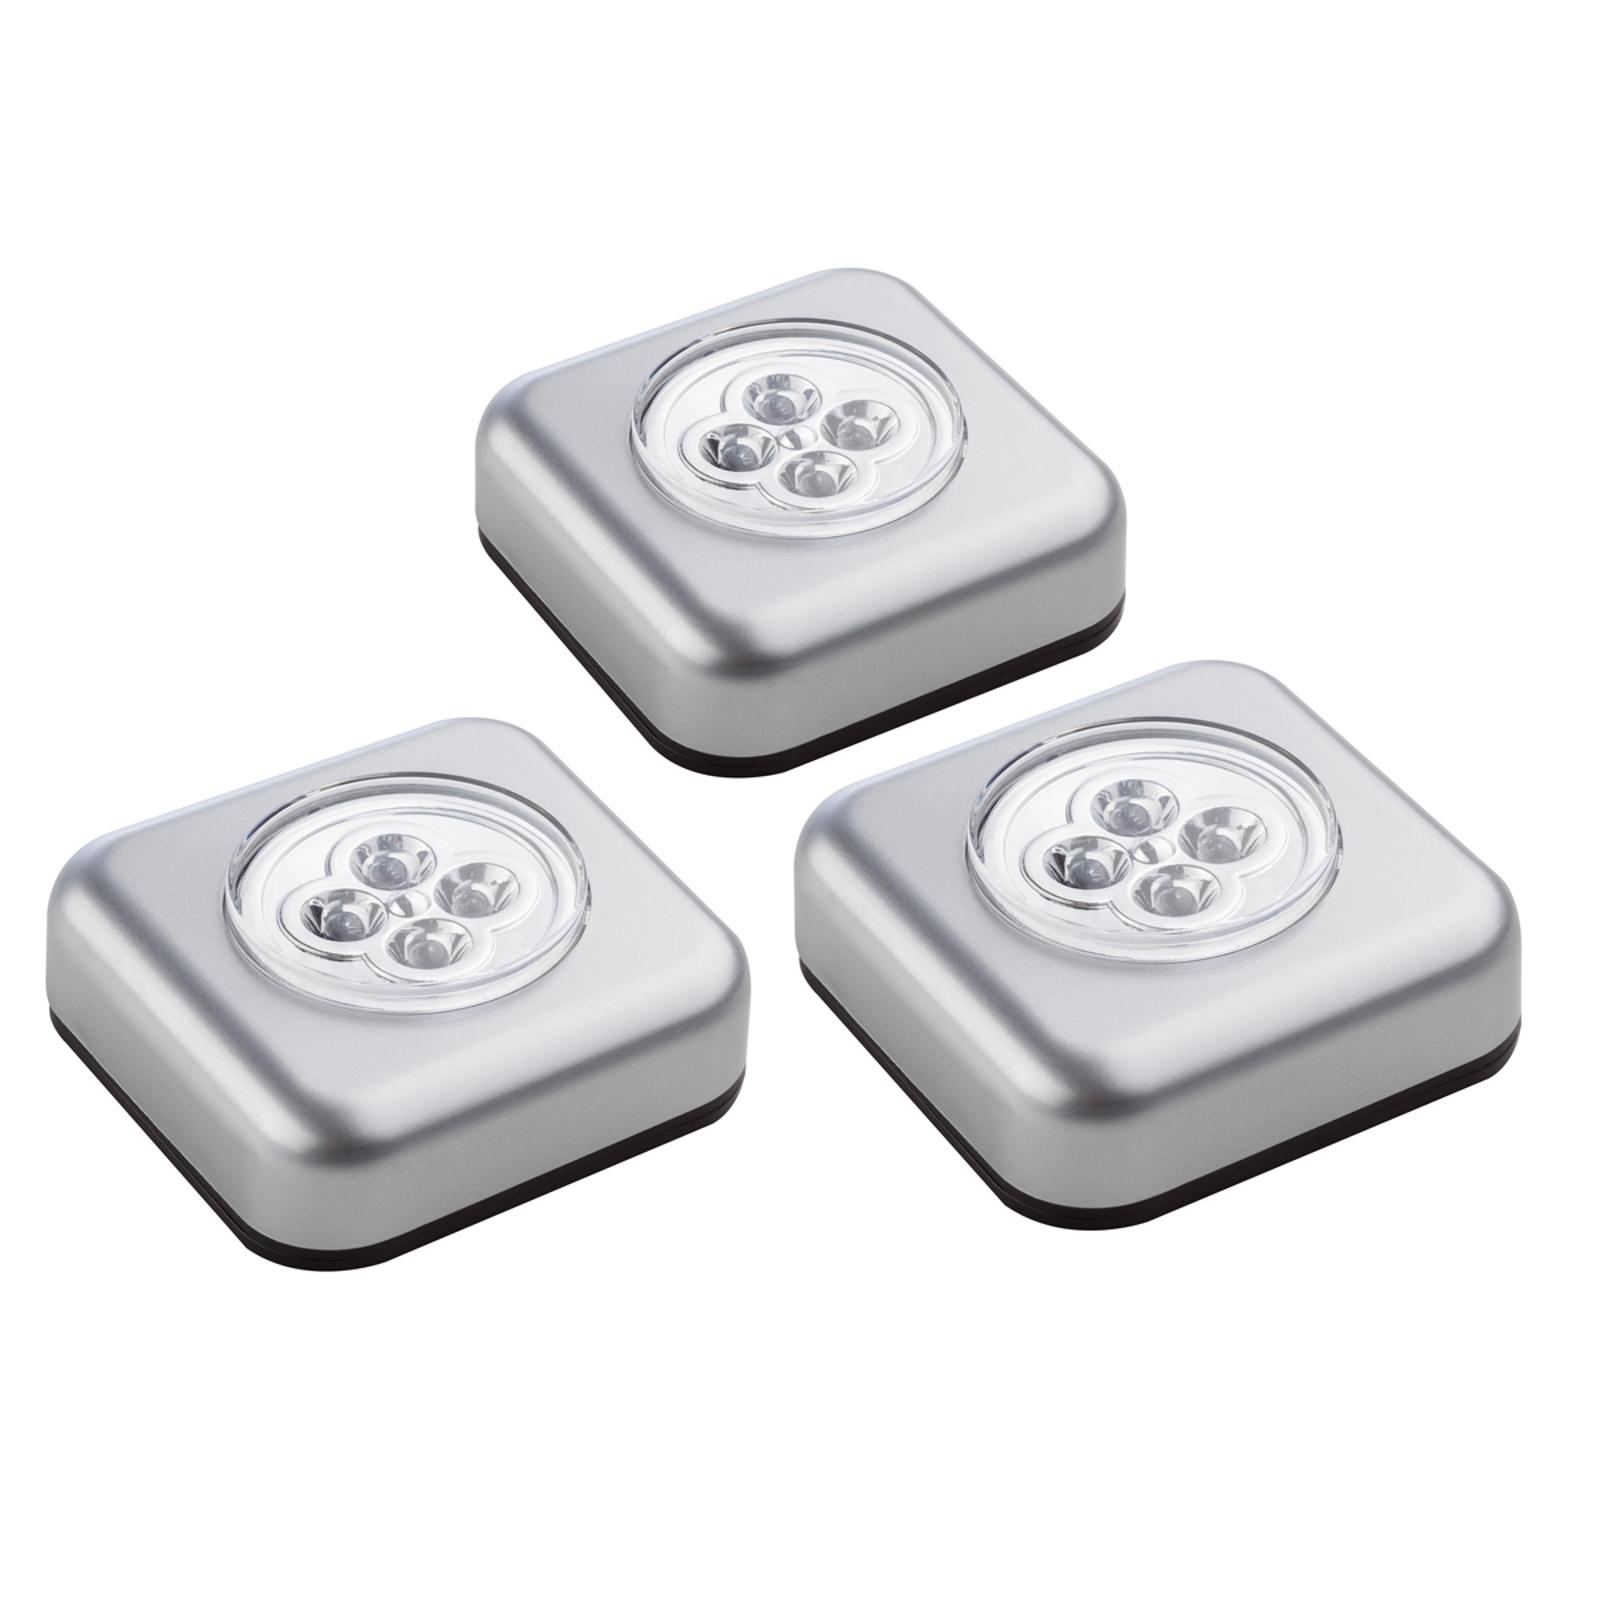 Touchlight – LED-kalustevalaisin, 3 kpl:n setti